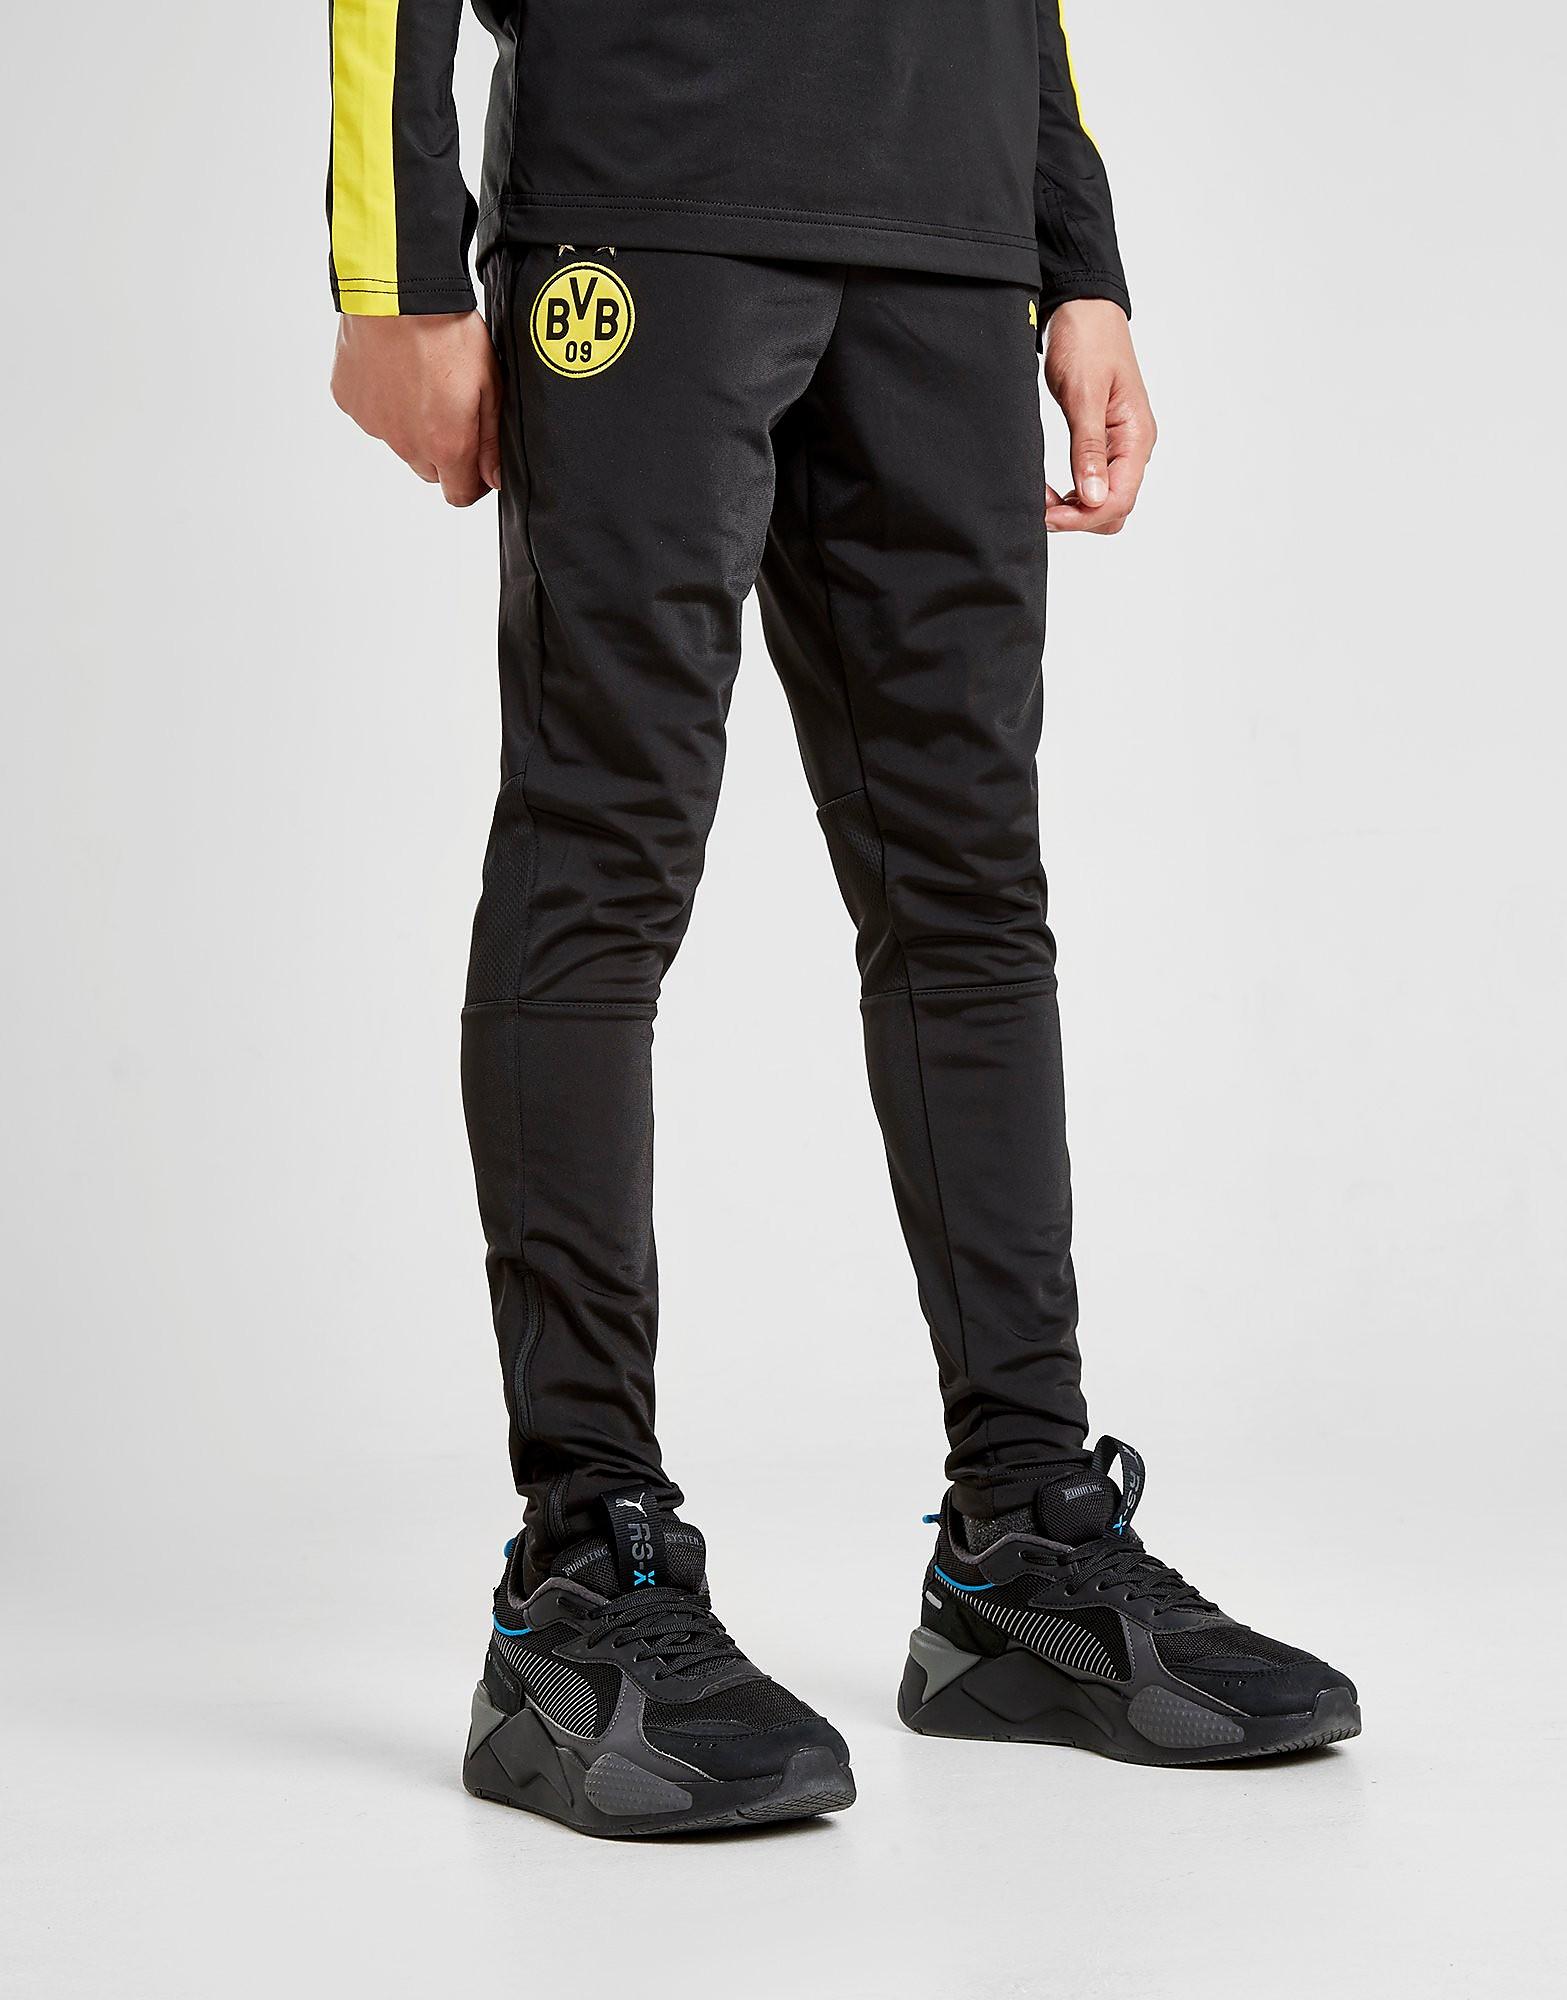 PUMA Borussia Dortmund Training Track Pants Junior Zwart Kind